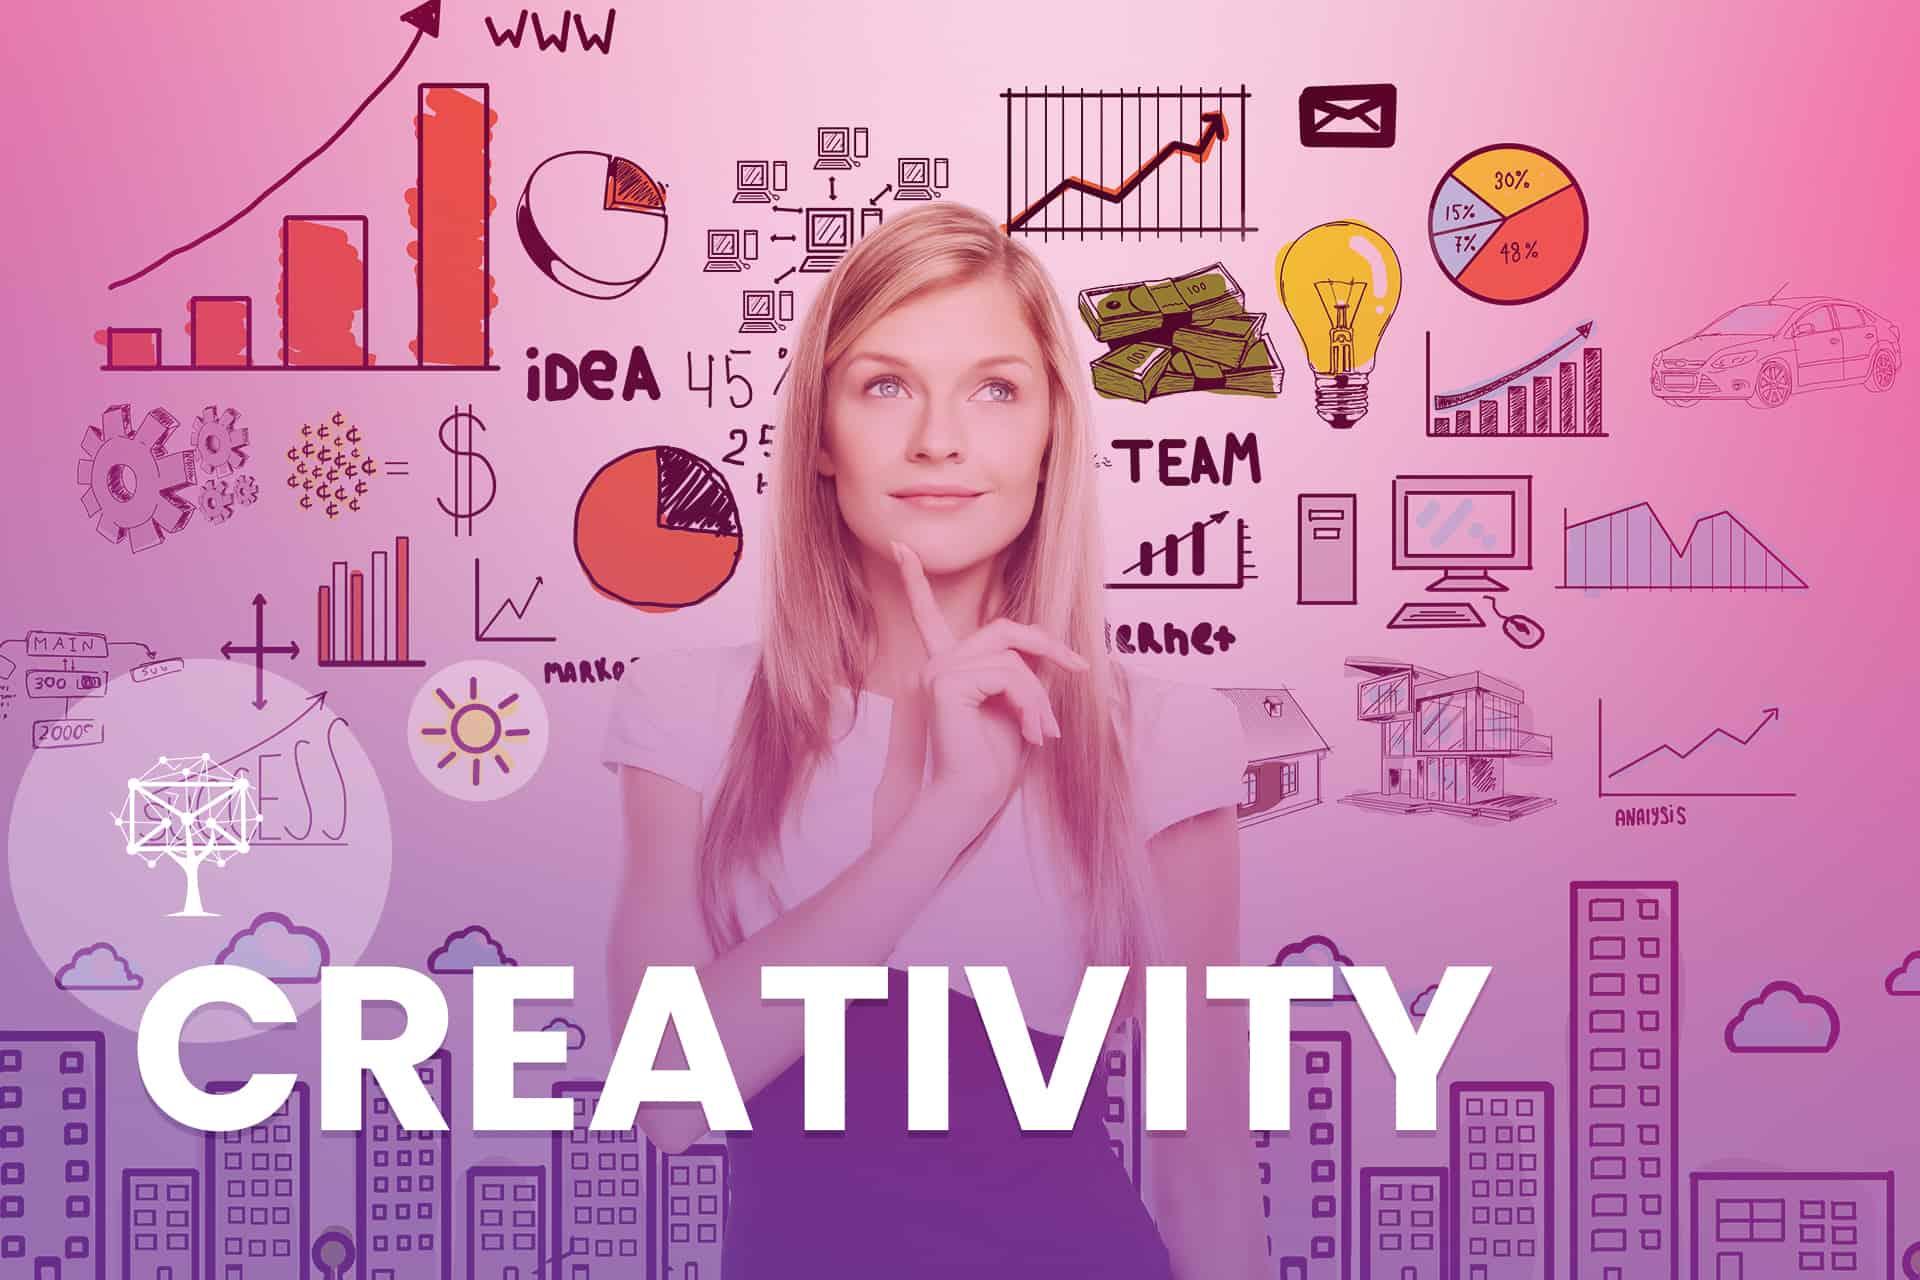 Creativity is a customer service skill